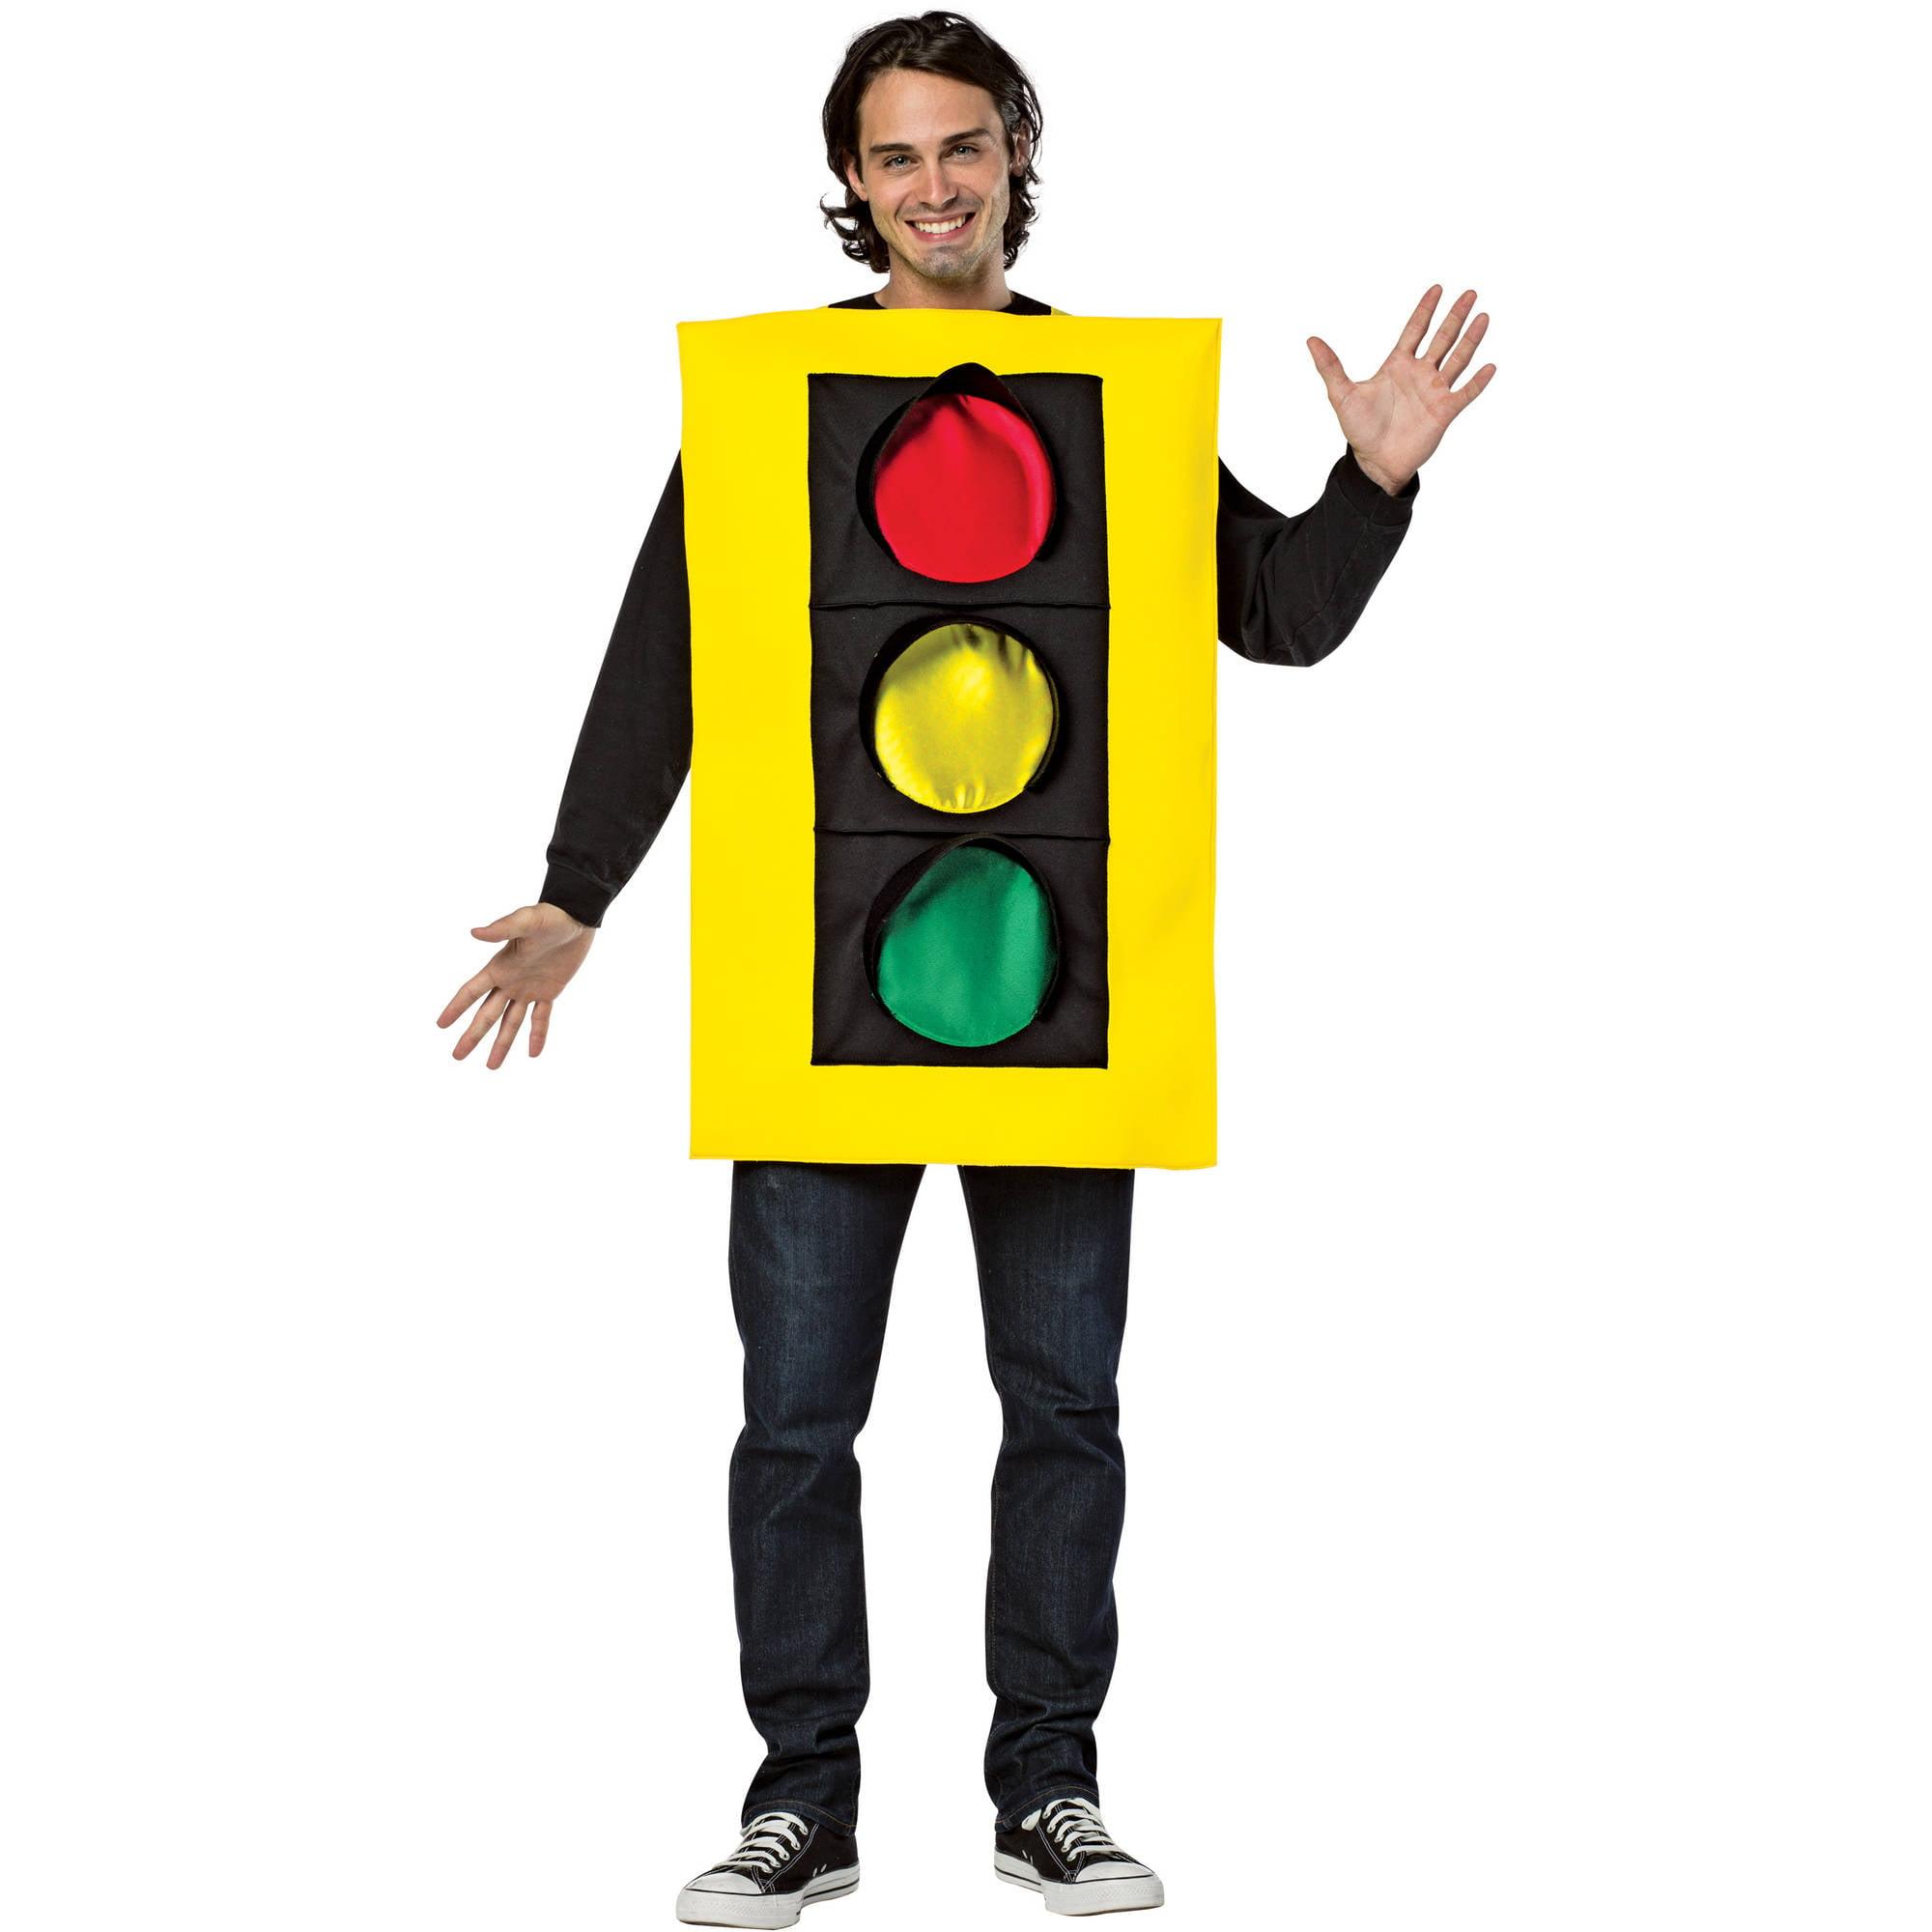 Traffic Light Tunic Men's Adult Halloween Costume, One Size, (40-46)